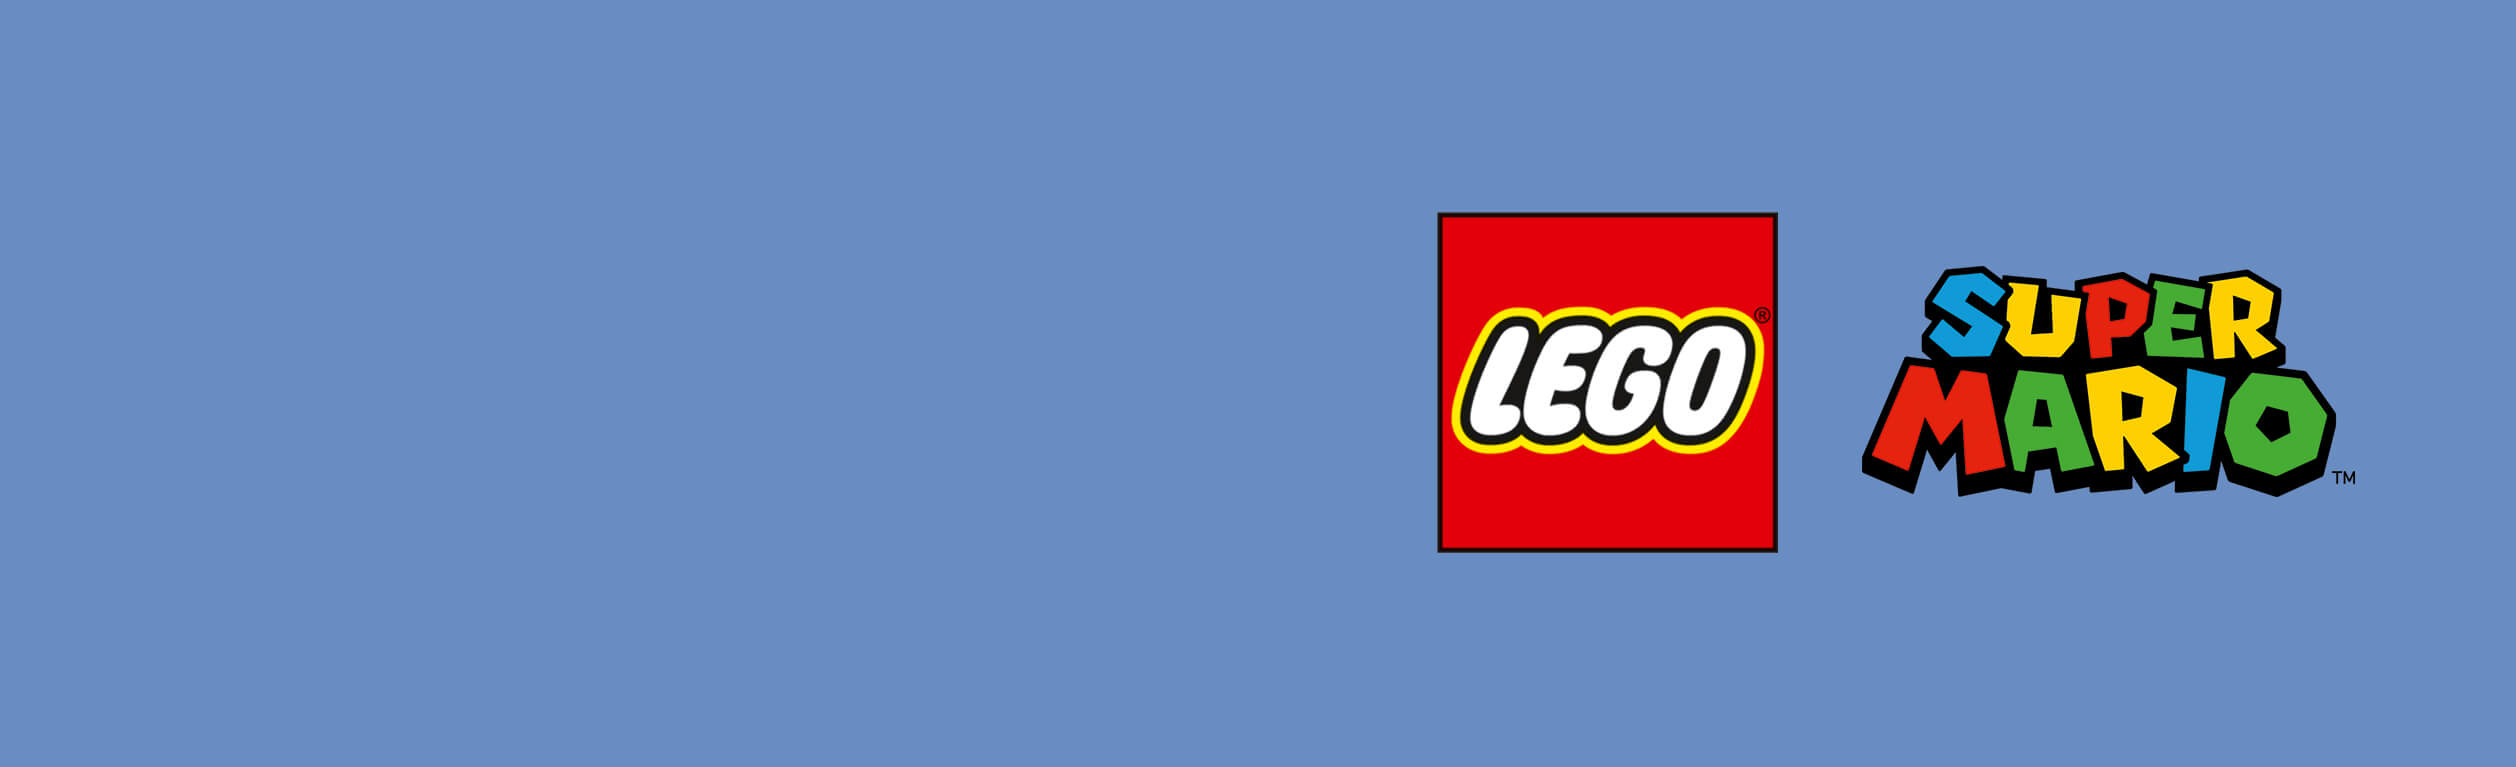 LEGO x Nintendo